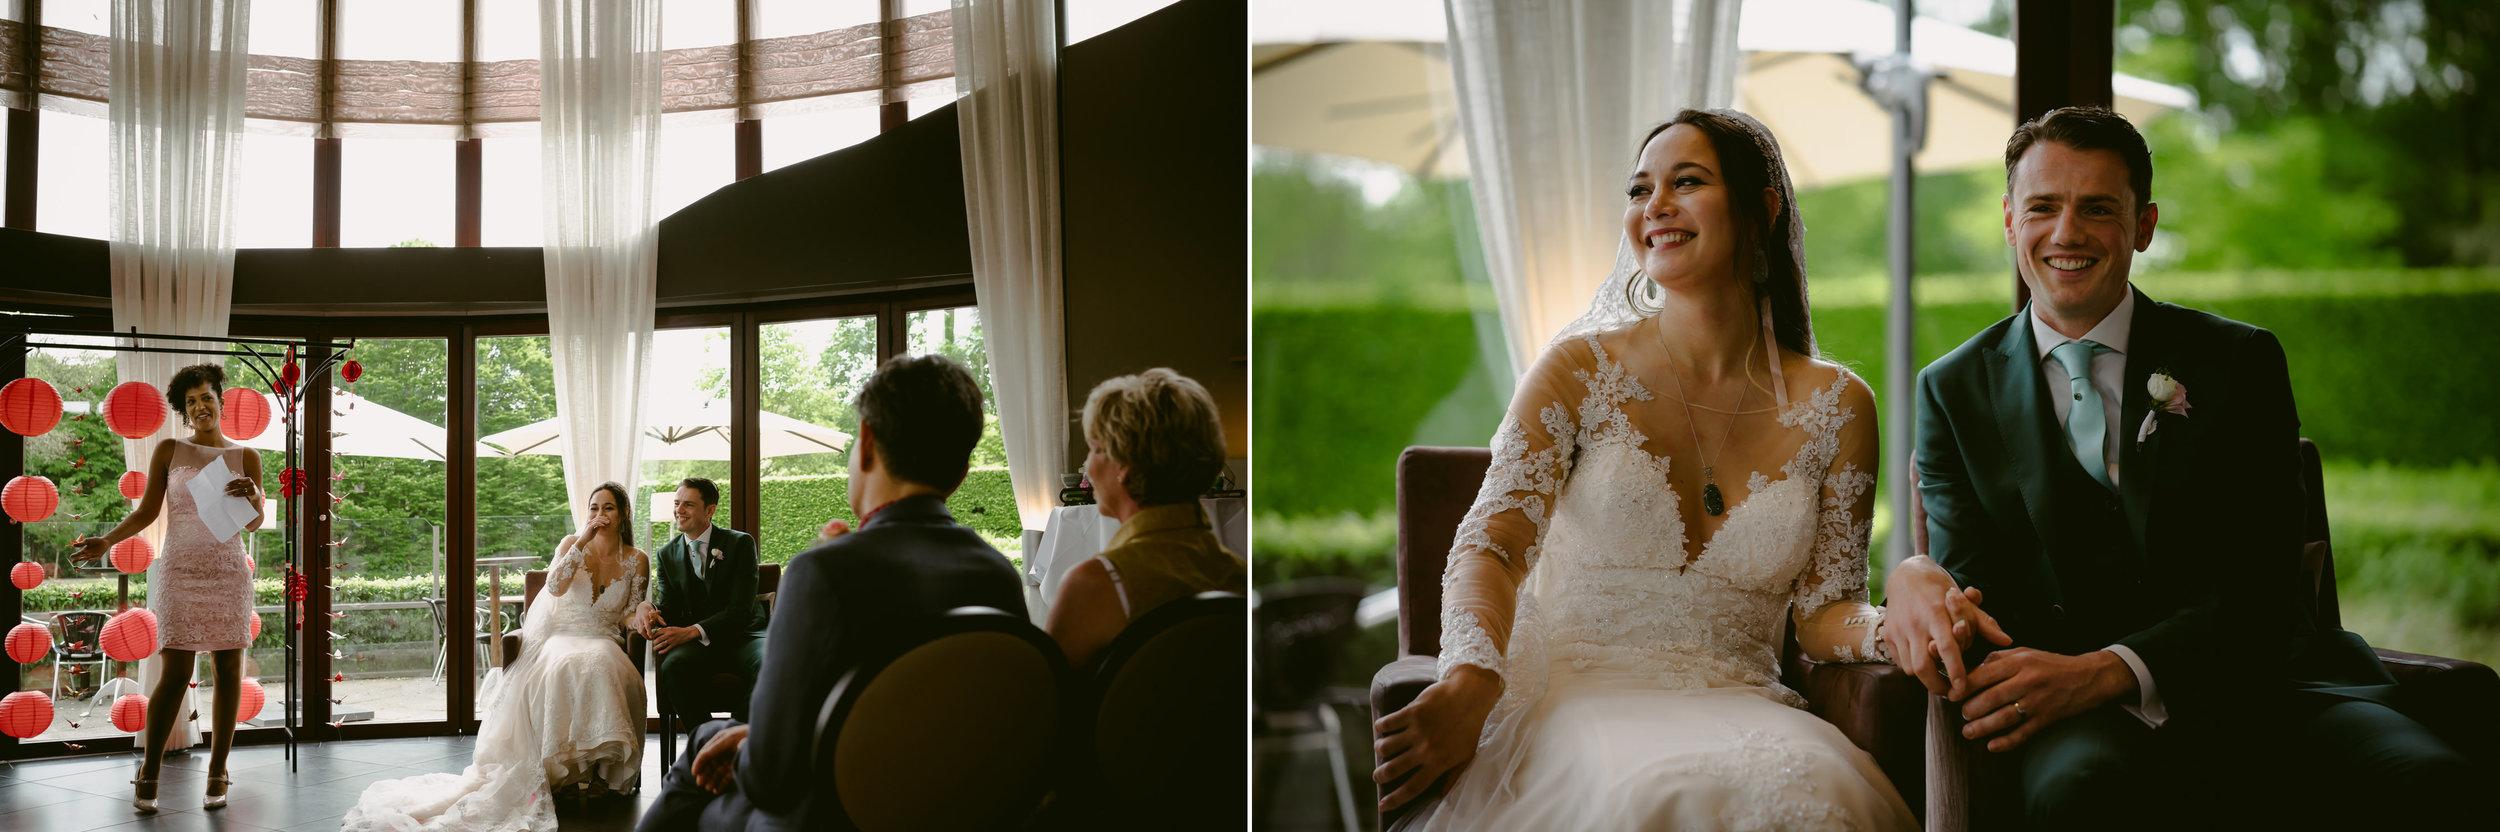 bruidsfotografie-amsterdam-utrecht-trouwfotograaf-mark-hadden-wedding-photography-Robin & Guus-184 copy.jpg